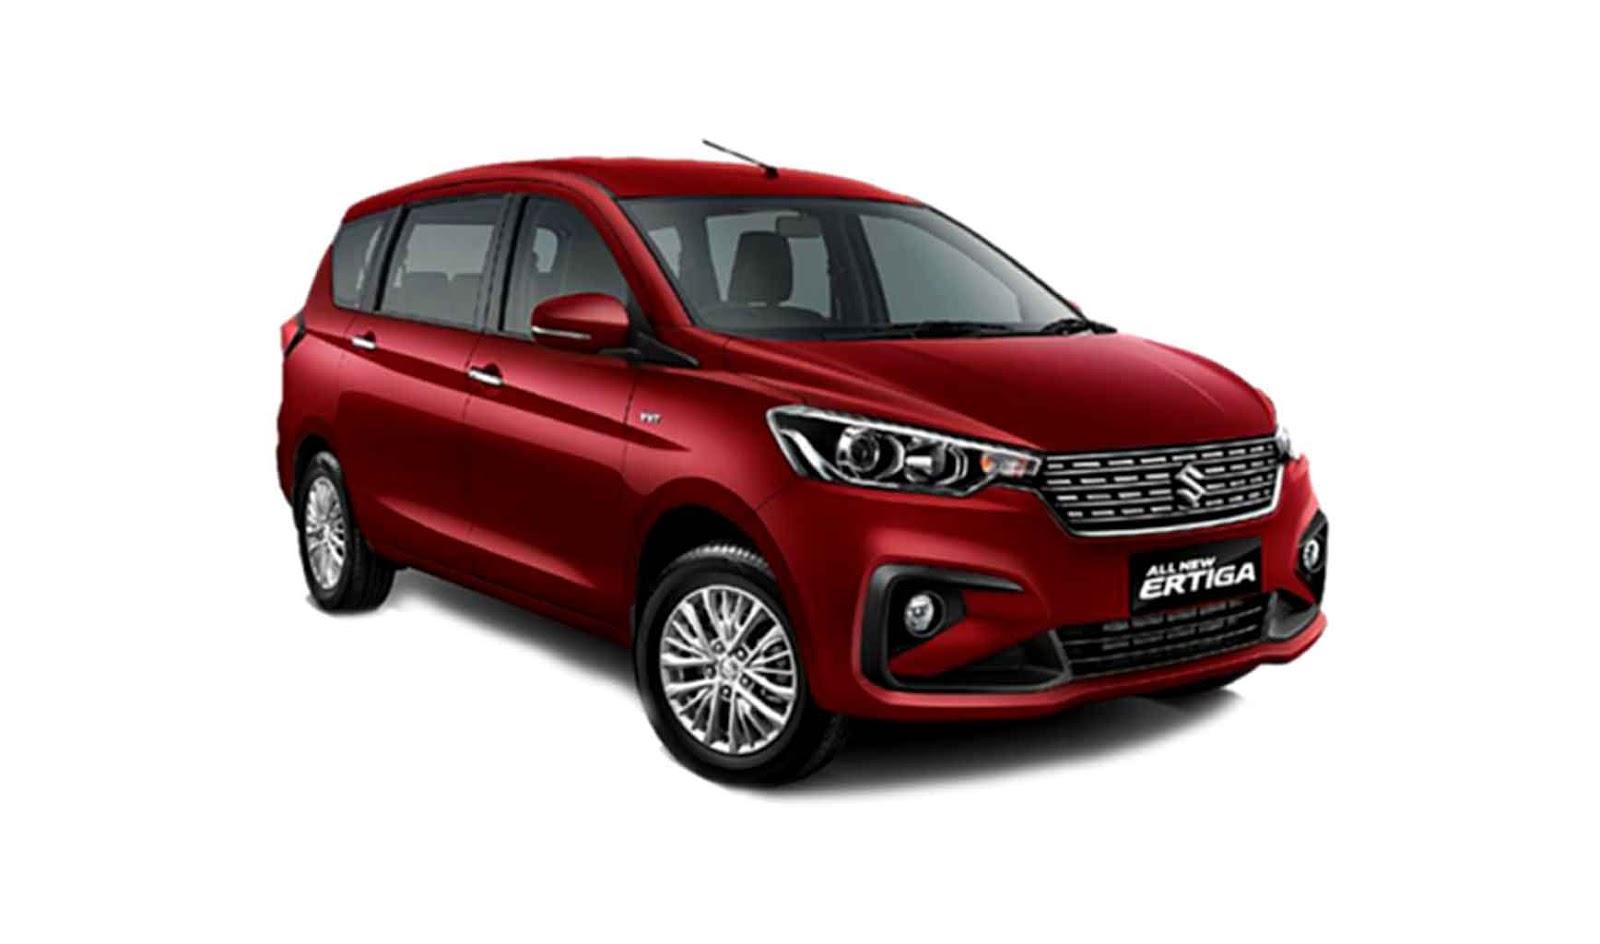 Best Quality MUV in India - Maruti Suzuki Ertiga